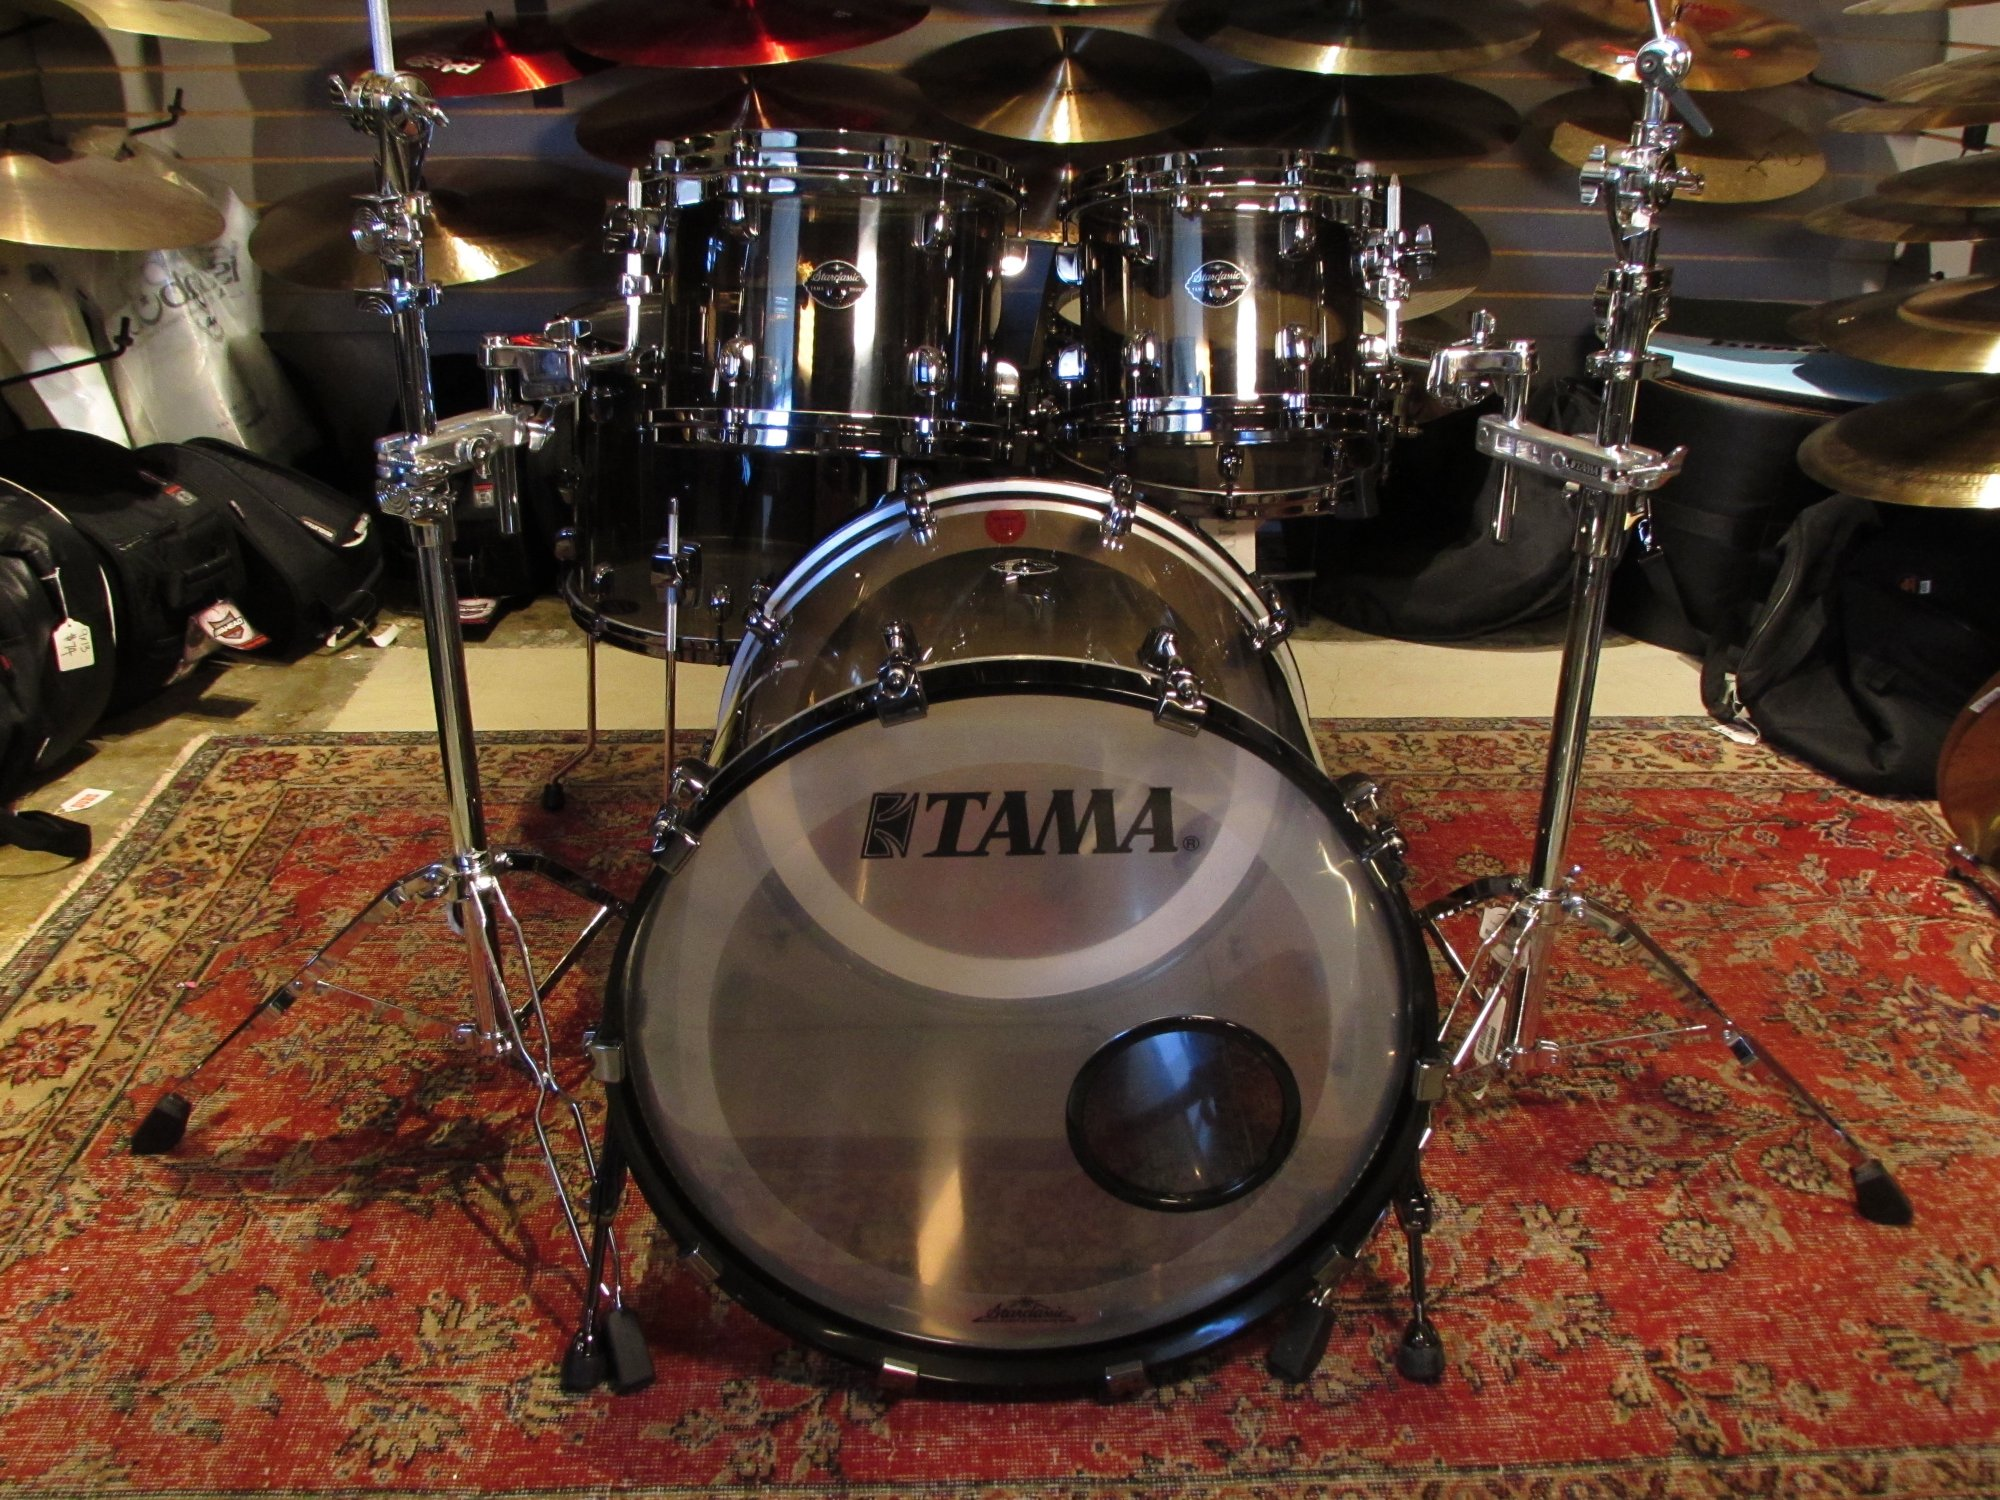 Tama Starclassic Mirage USA Acrylic Drumset Black Ice